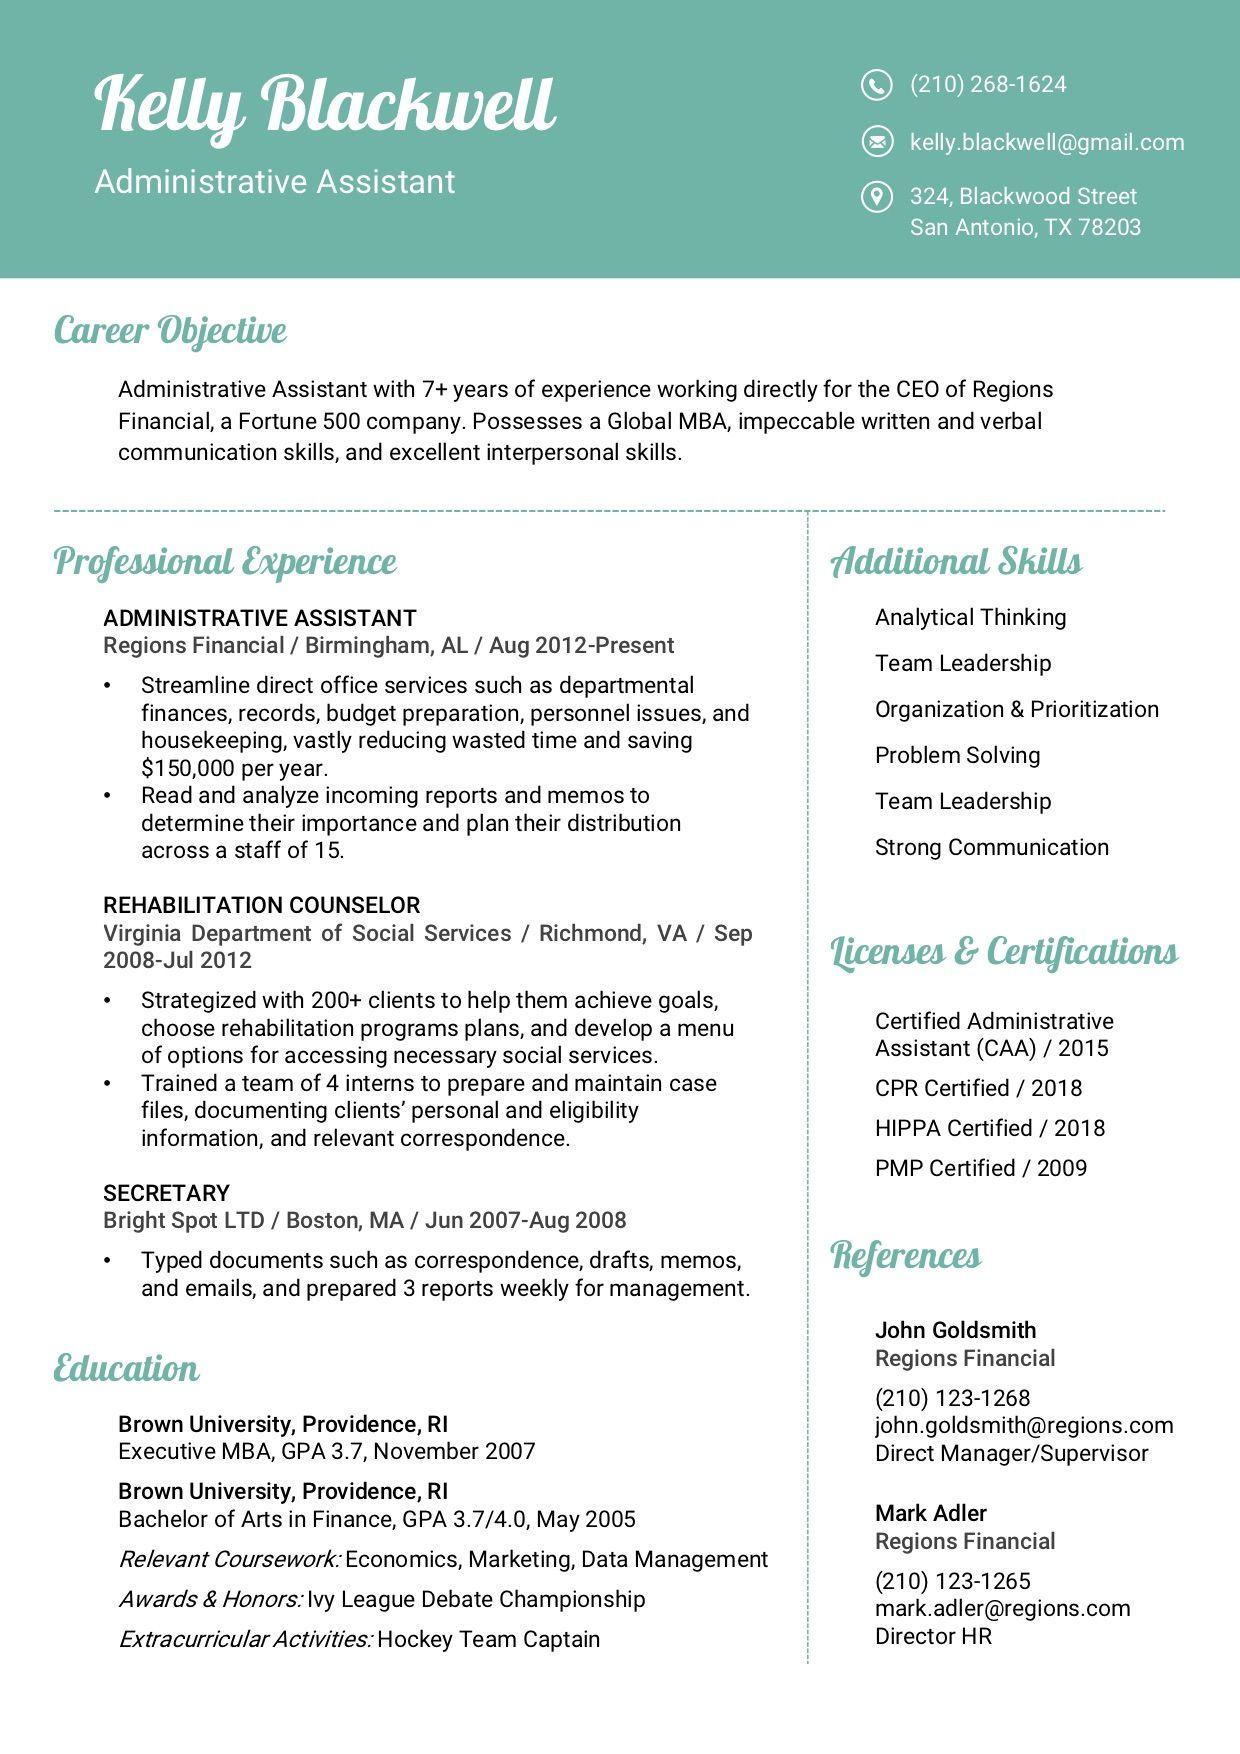 Resume Template 8d Rc Verbal Communication Skills Resume Templates Creative Resume